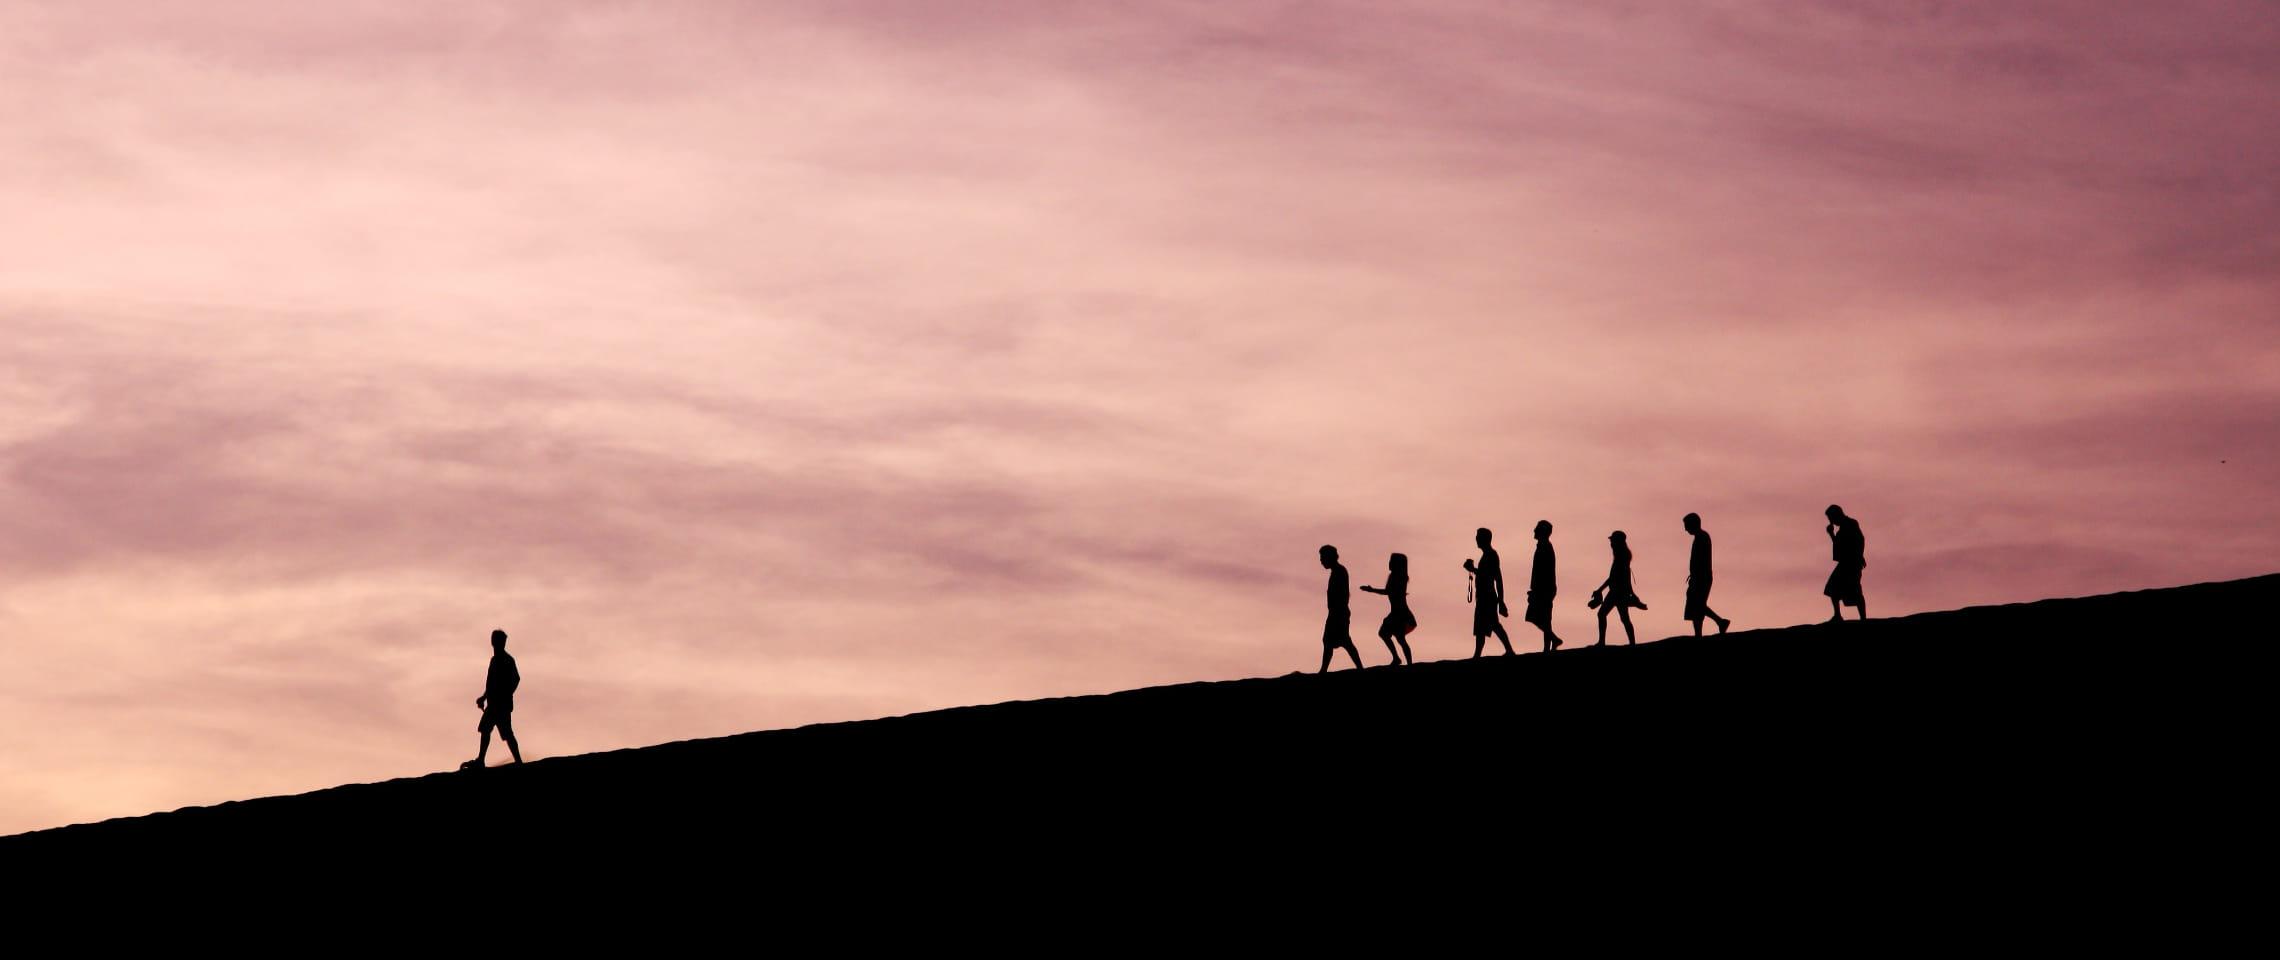 Leadership-Main-Image@2x